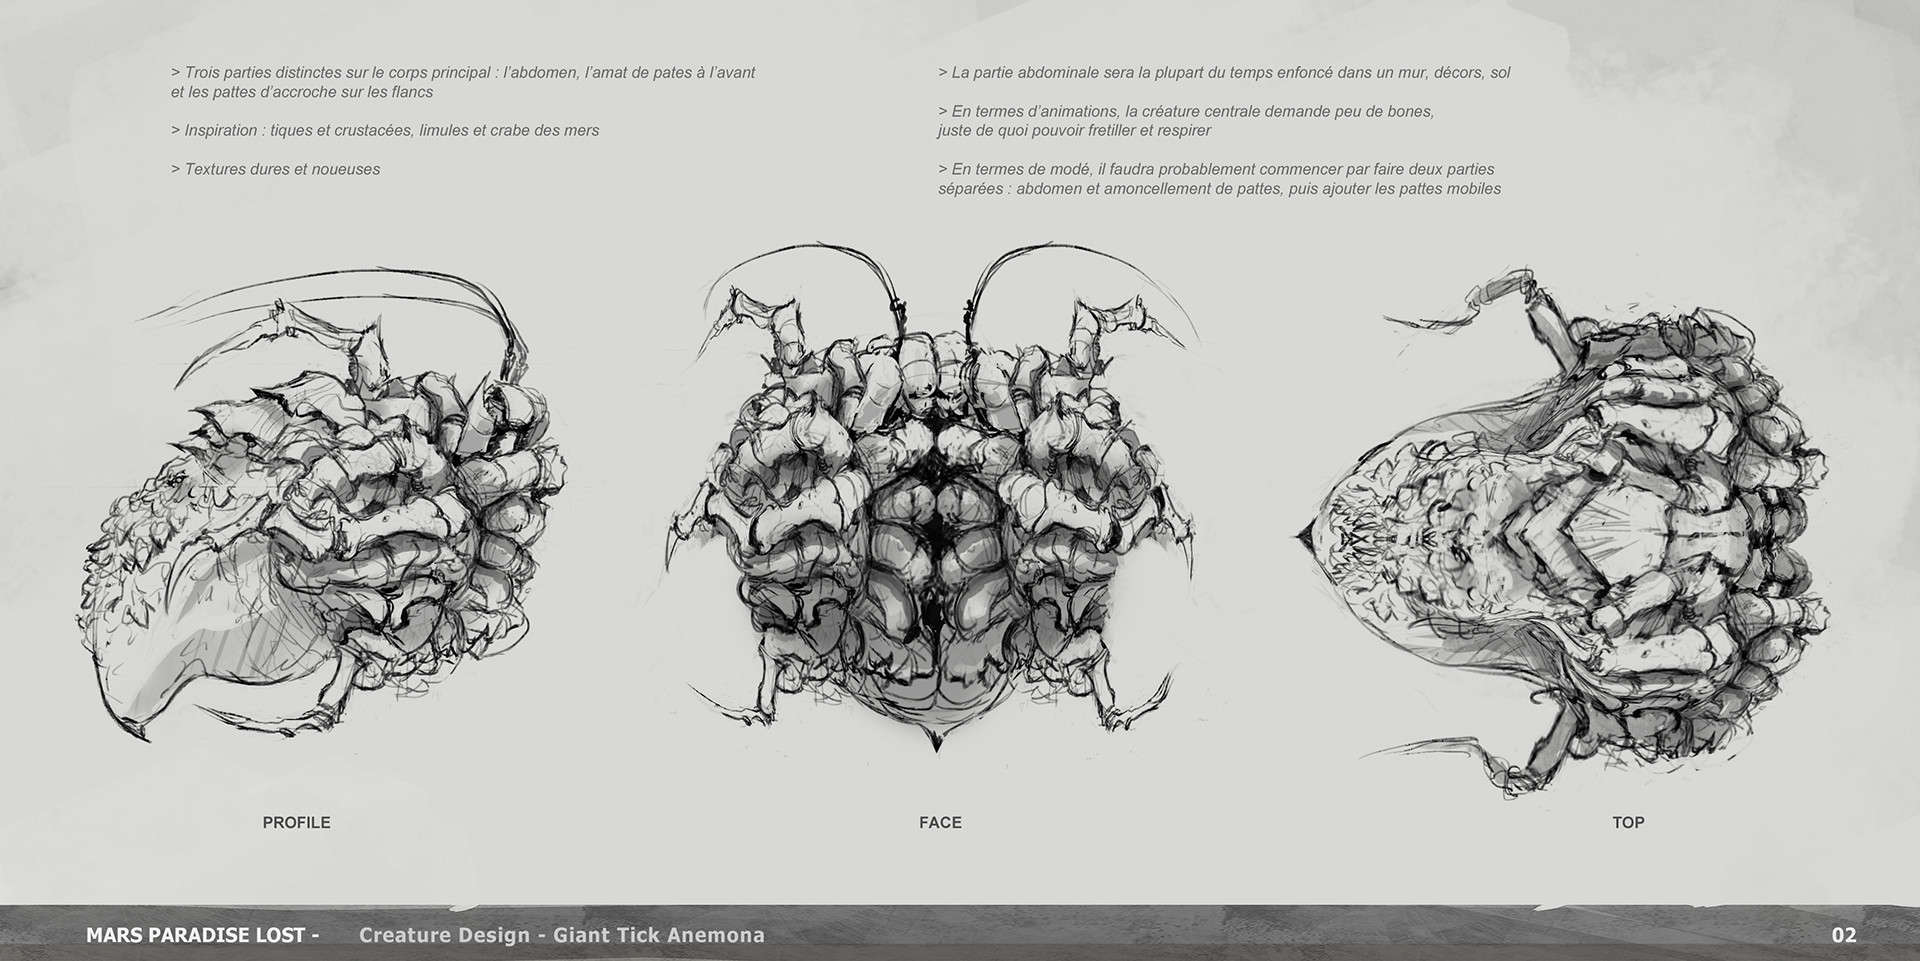 Alexandre chaudret mpl creature anemona research02